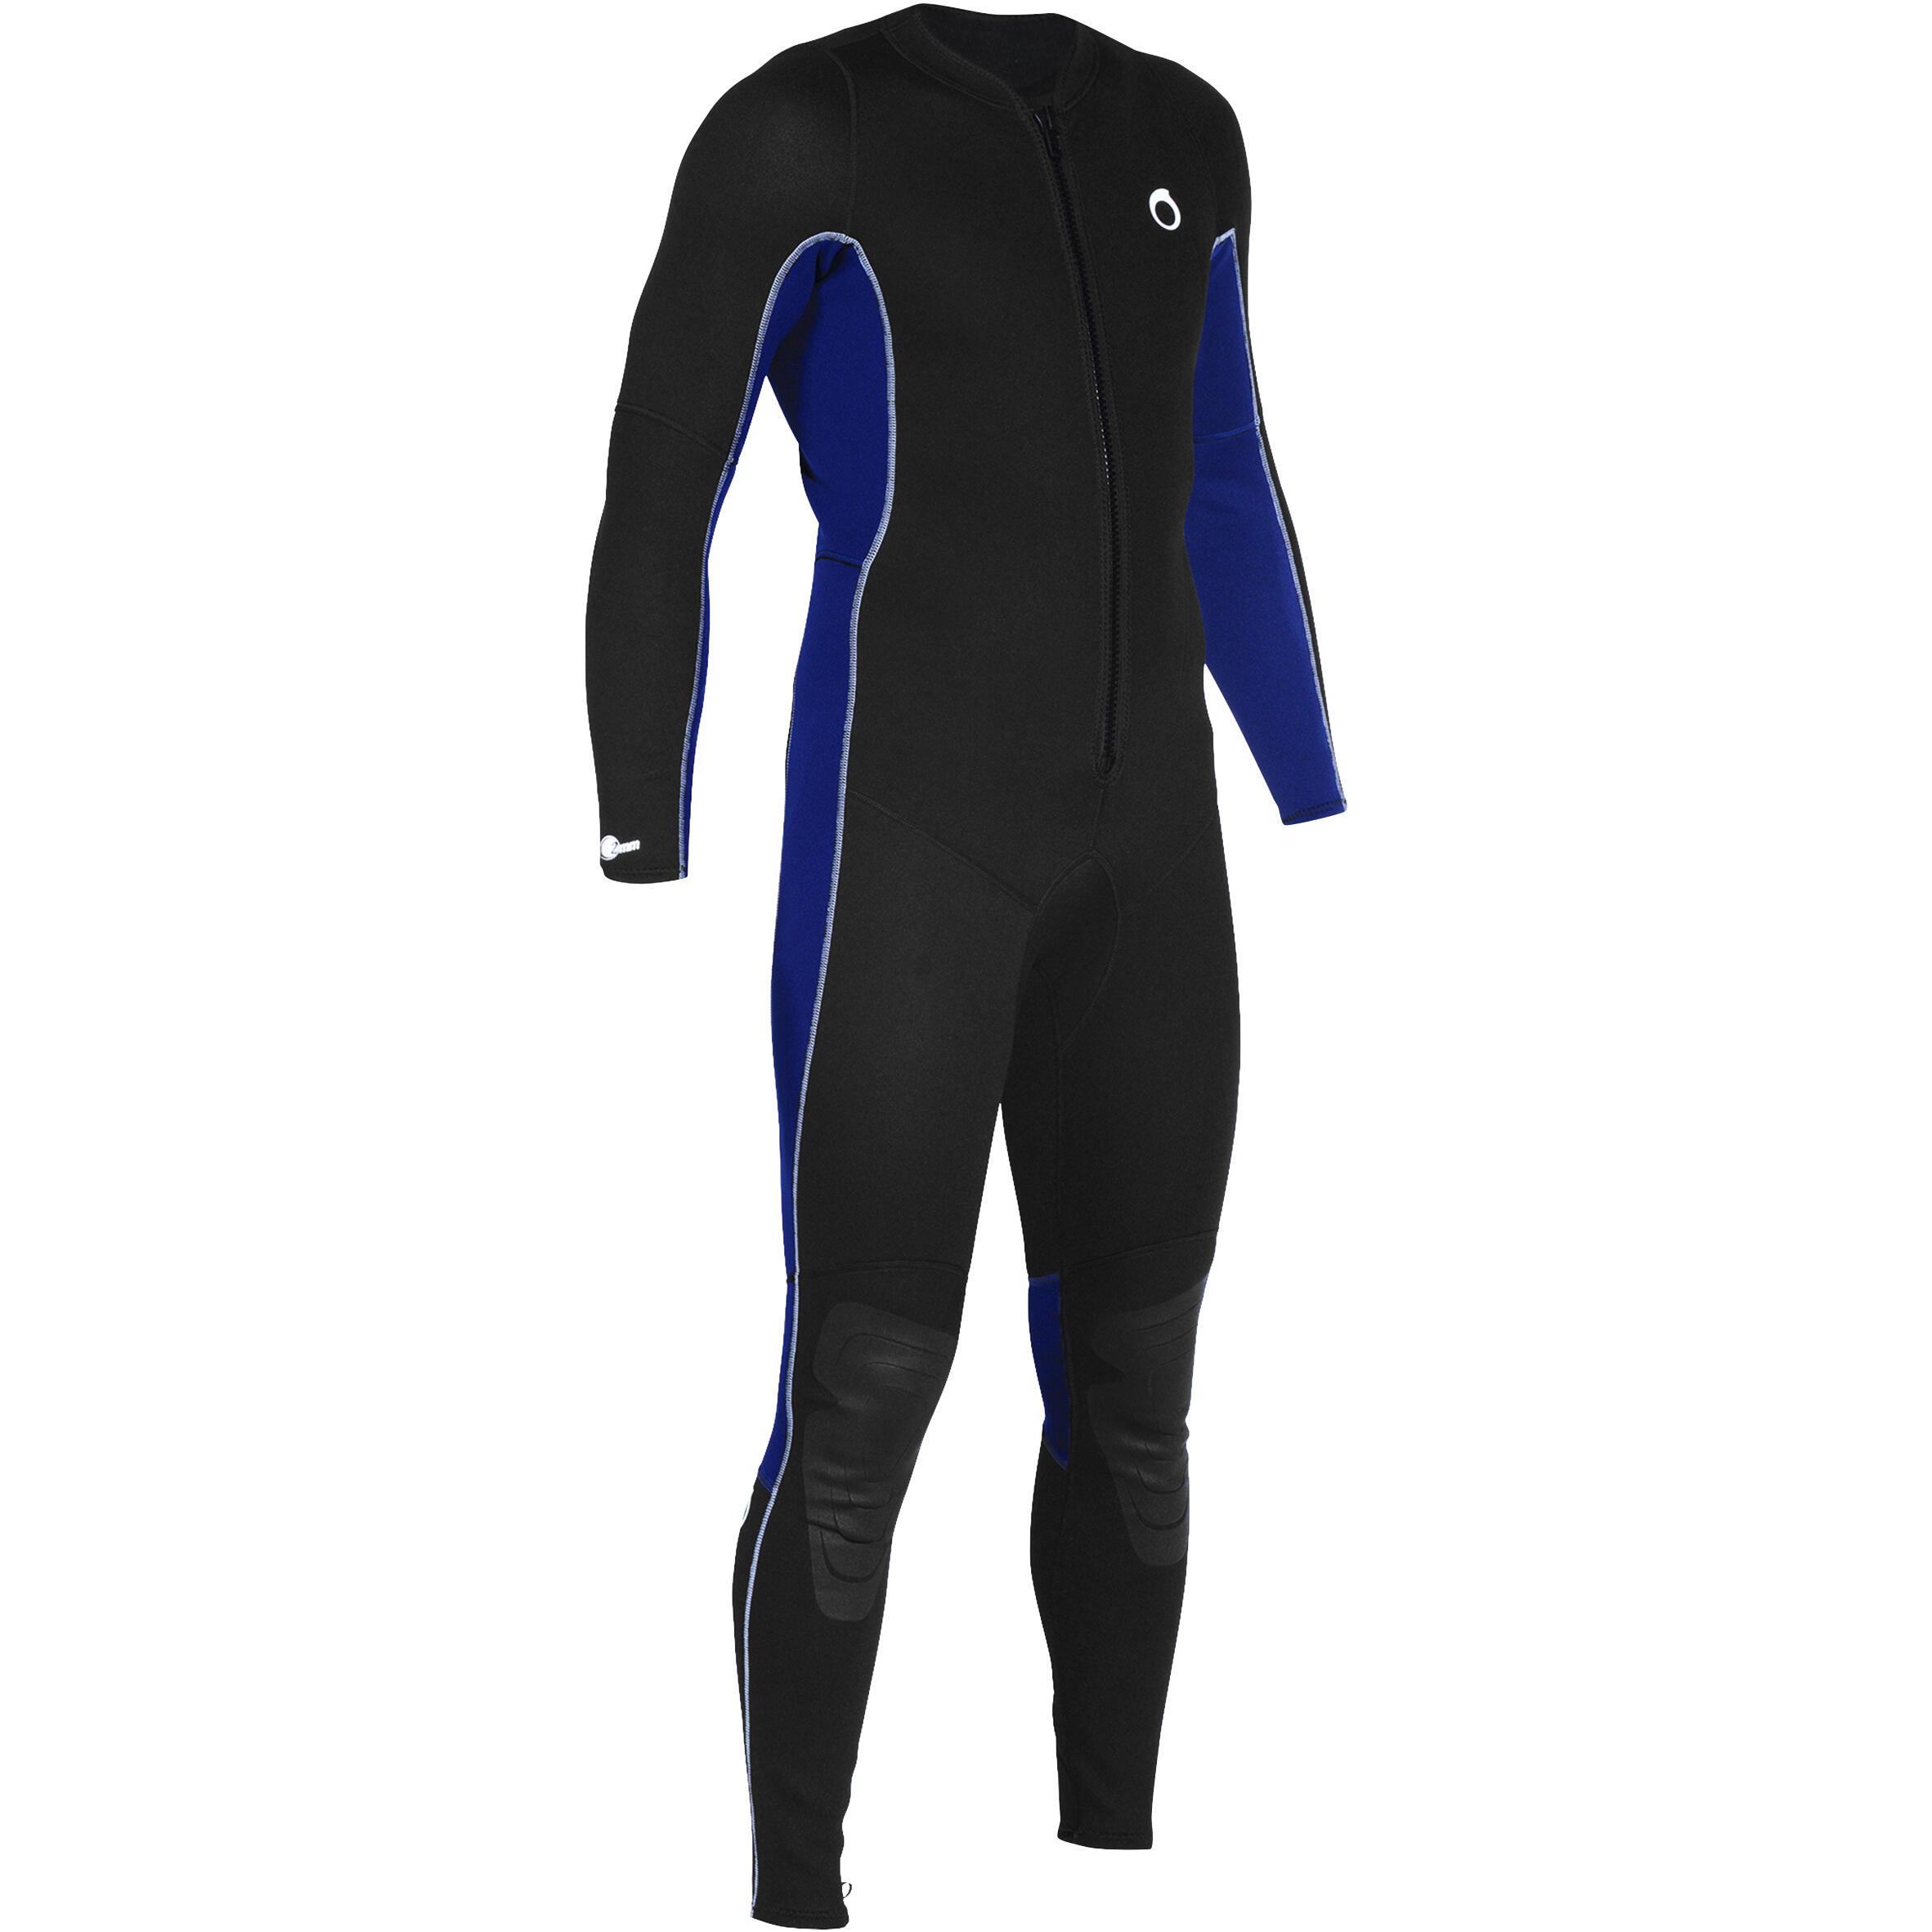 Wetsuit Lengkap 2mm Snorkeling Pria - Hitam